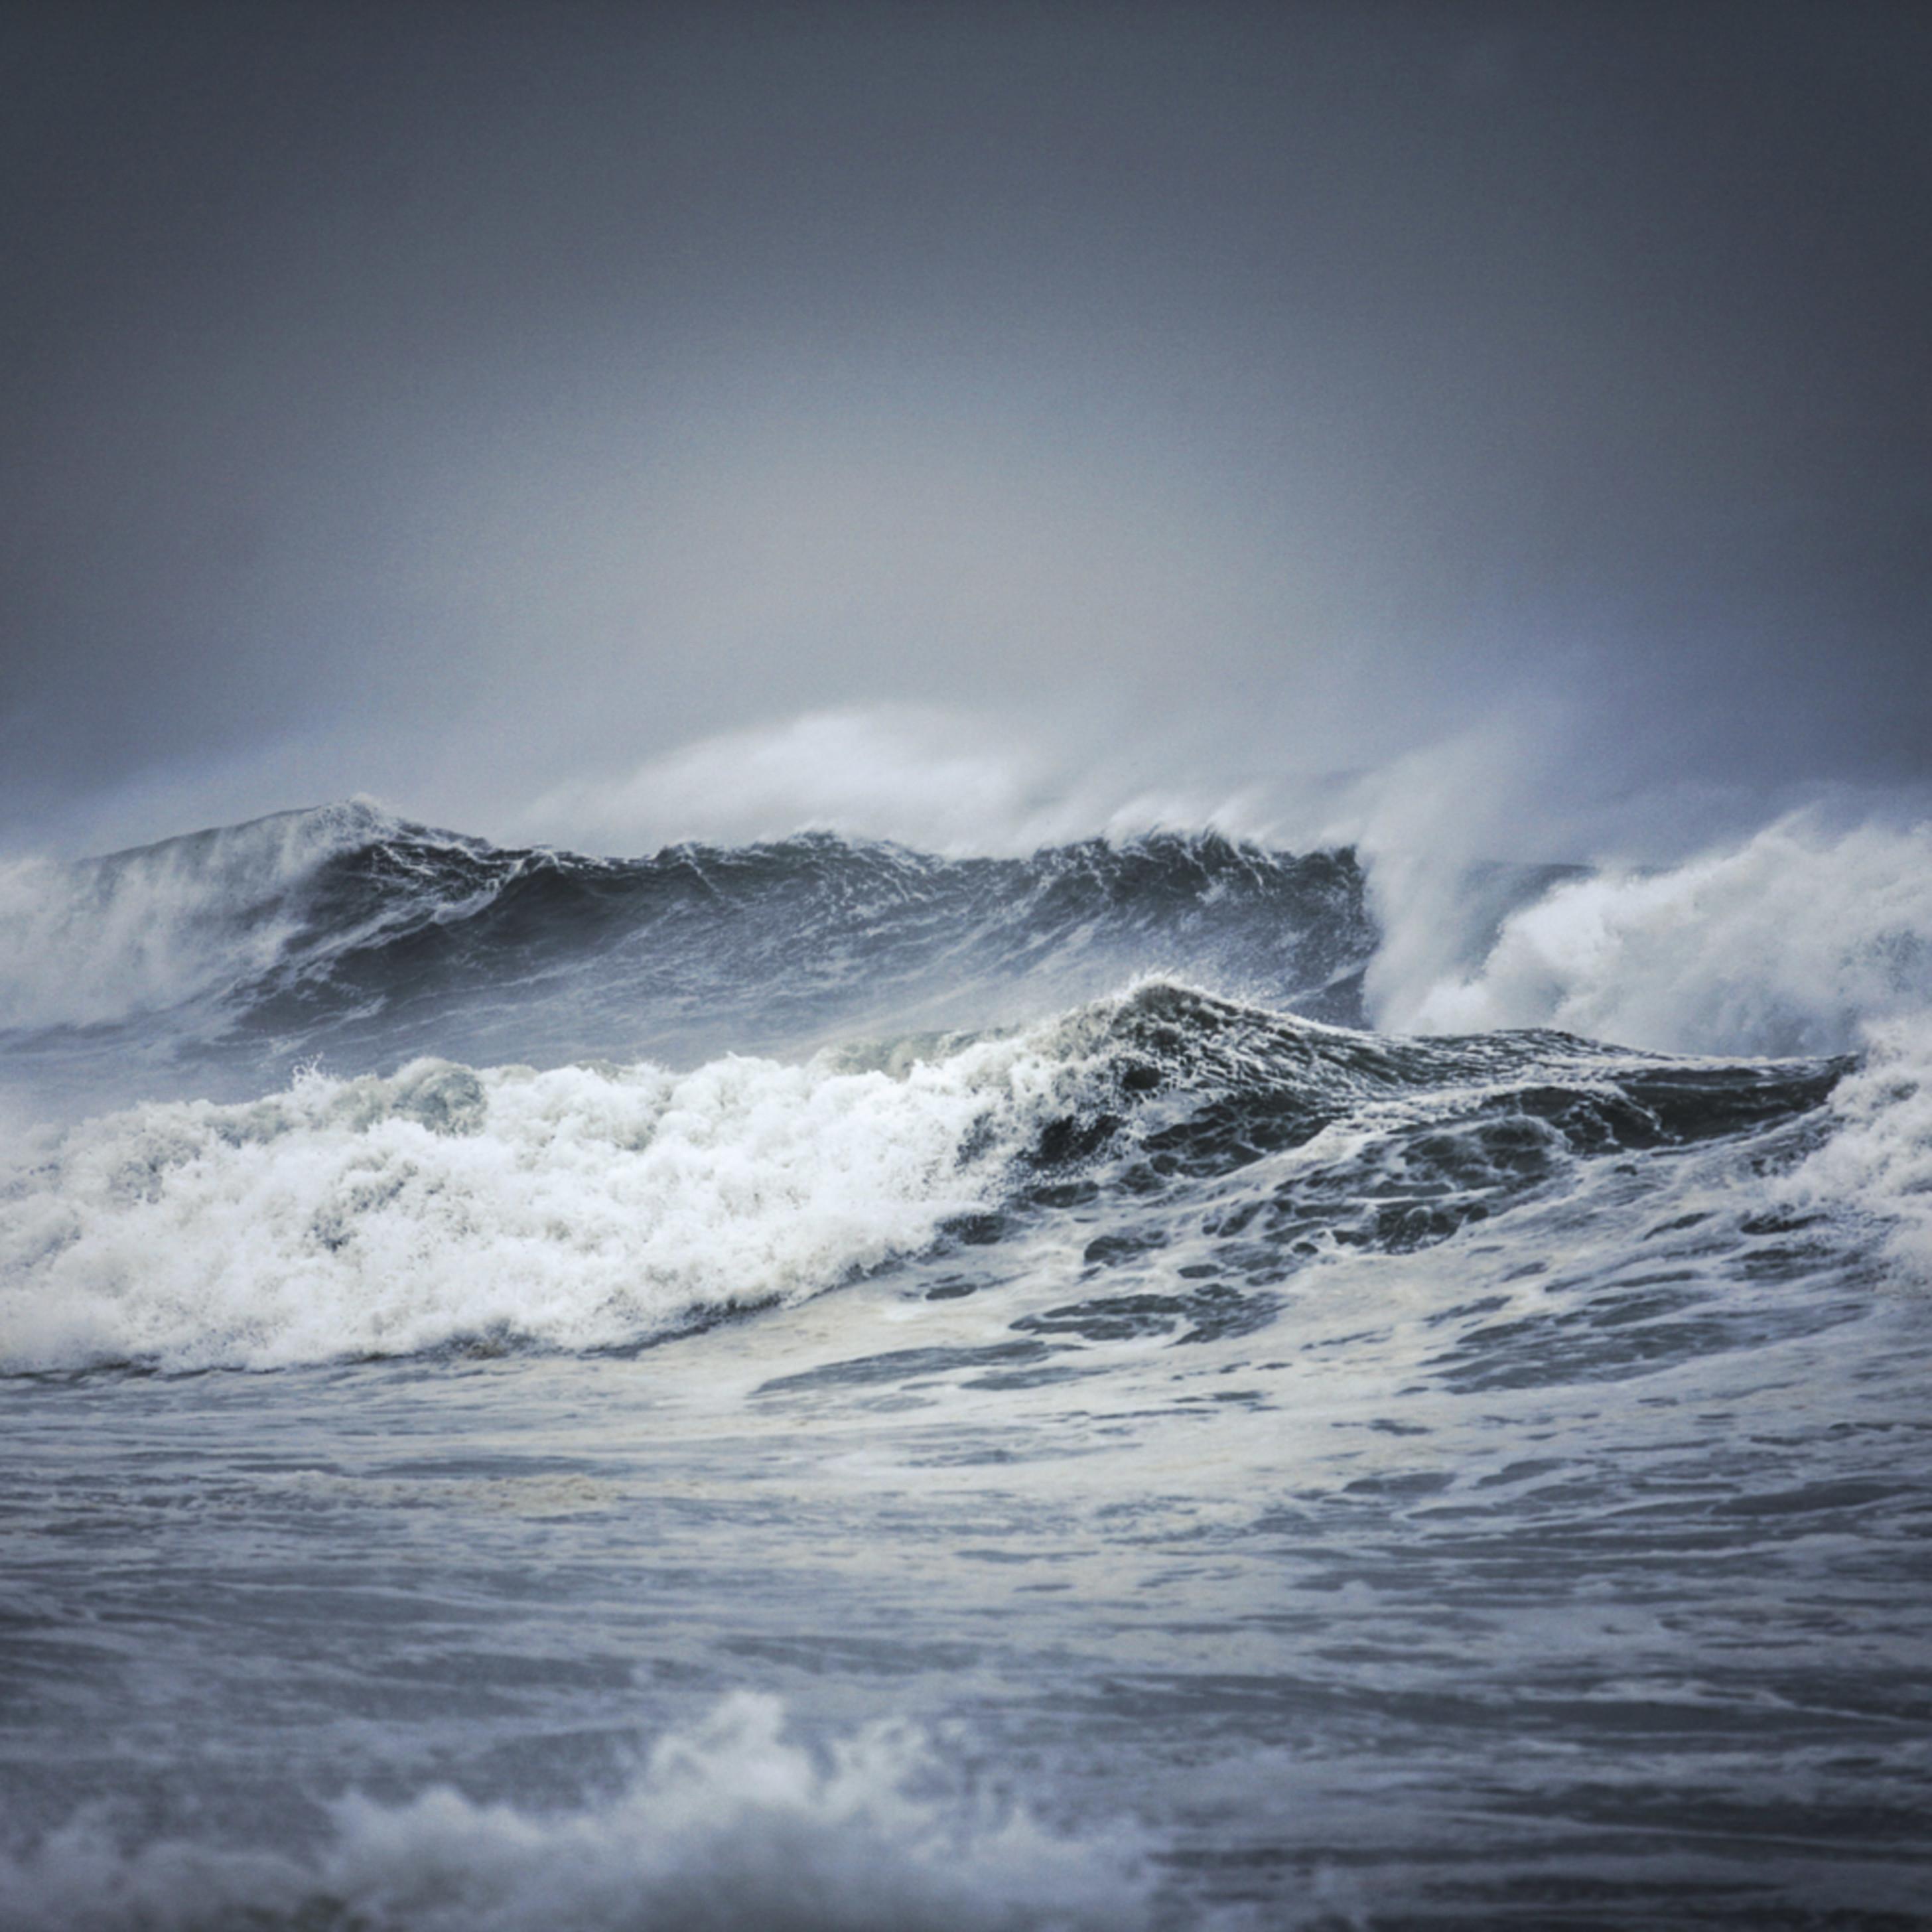 Swallowing seas oixwby